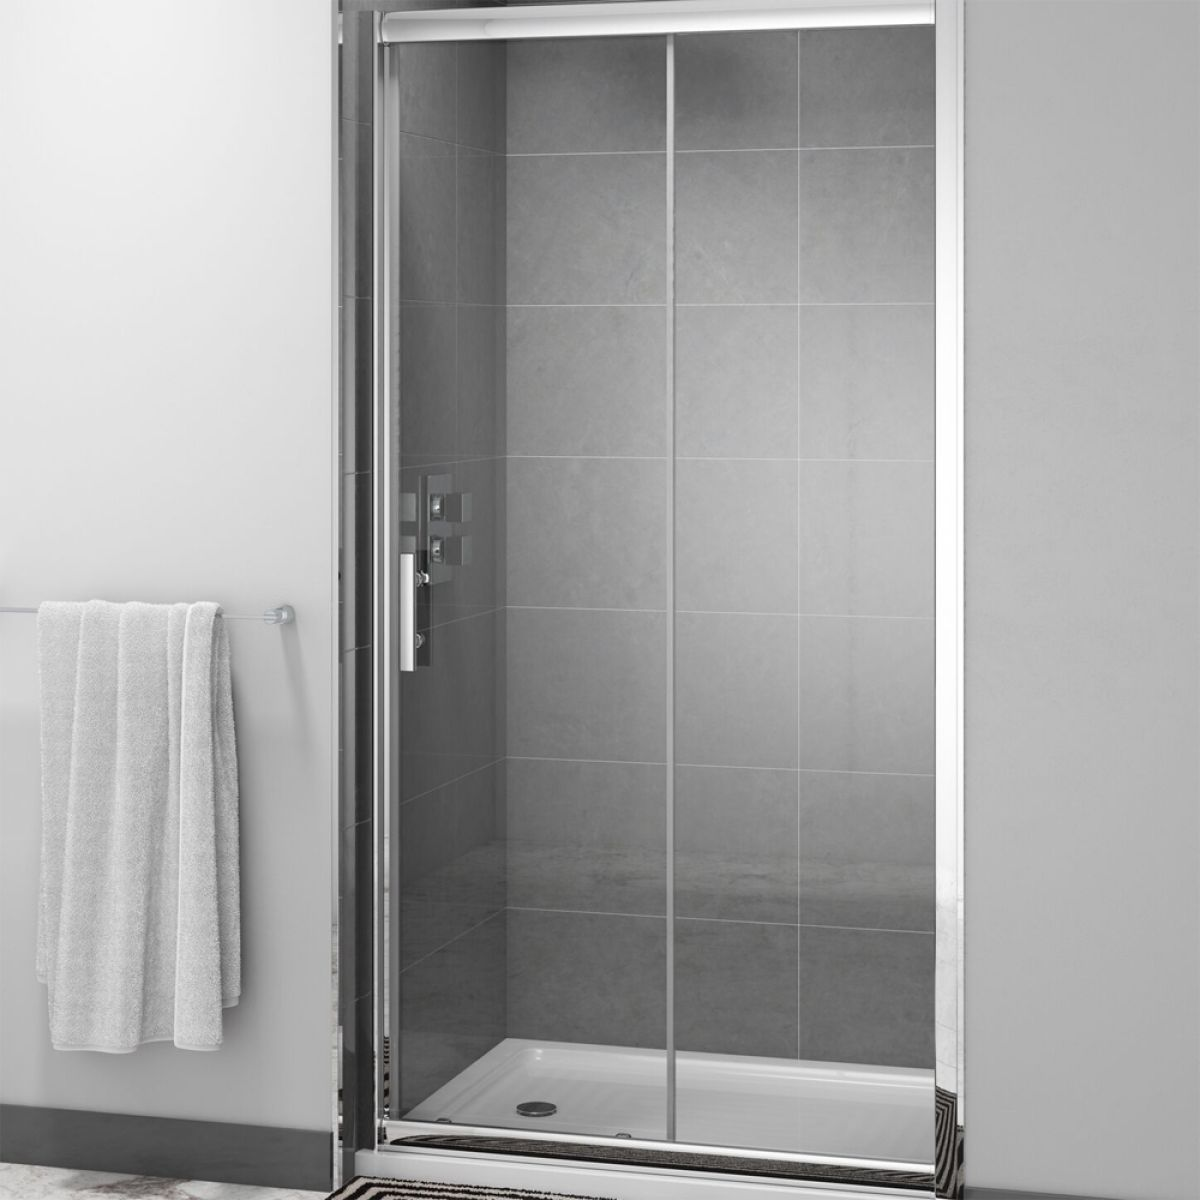 Cassellie Cass Six Sliding Shower Door with Optional Side Panel